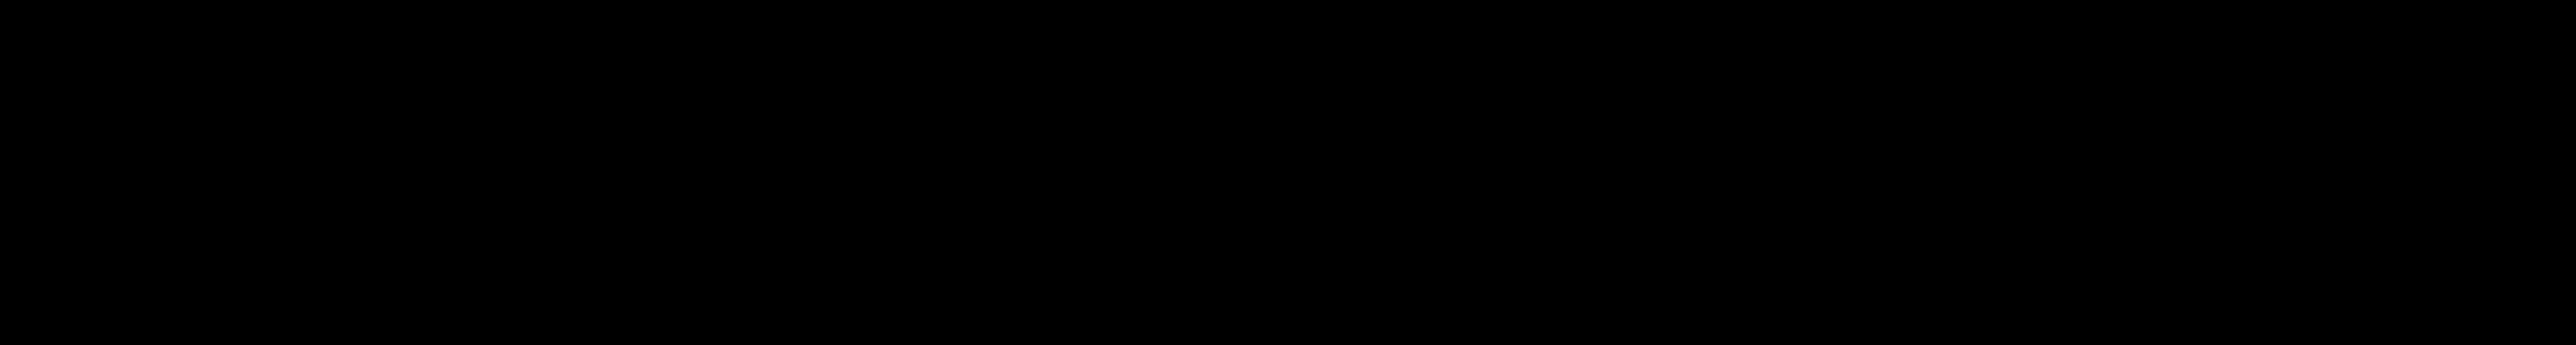 Logo Strandvägskajen, Östermalm - @strandvagskajen - strandvagskajen.se